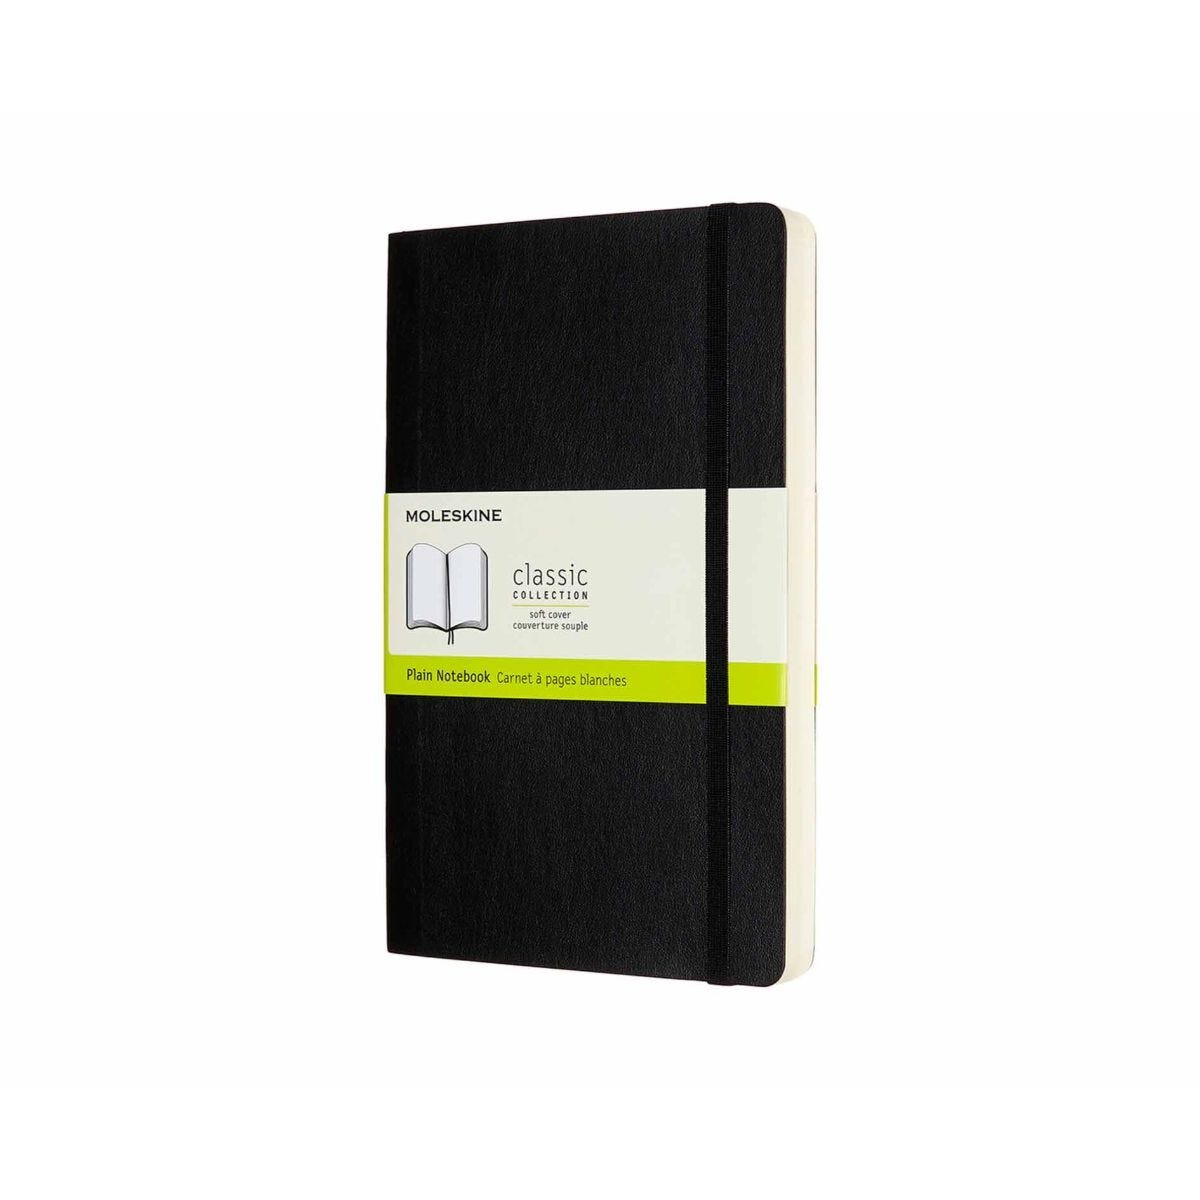 Moleskine Classics Expanded Soft Cover Notebook Large Plain